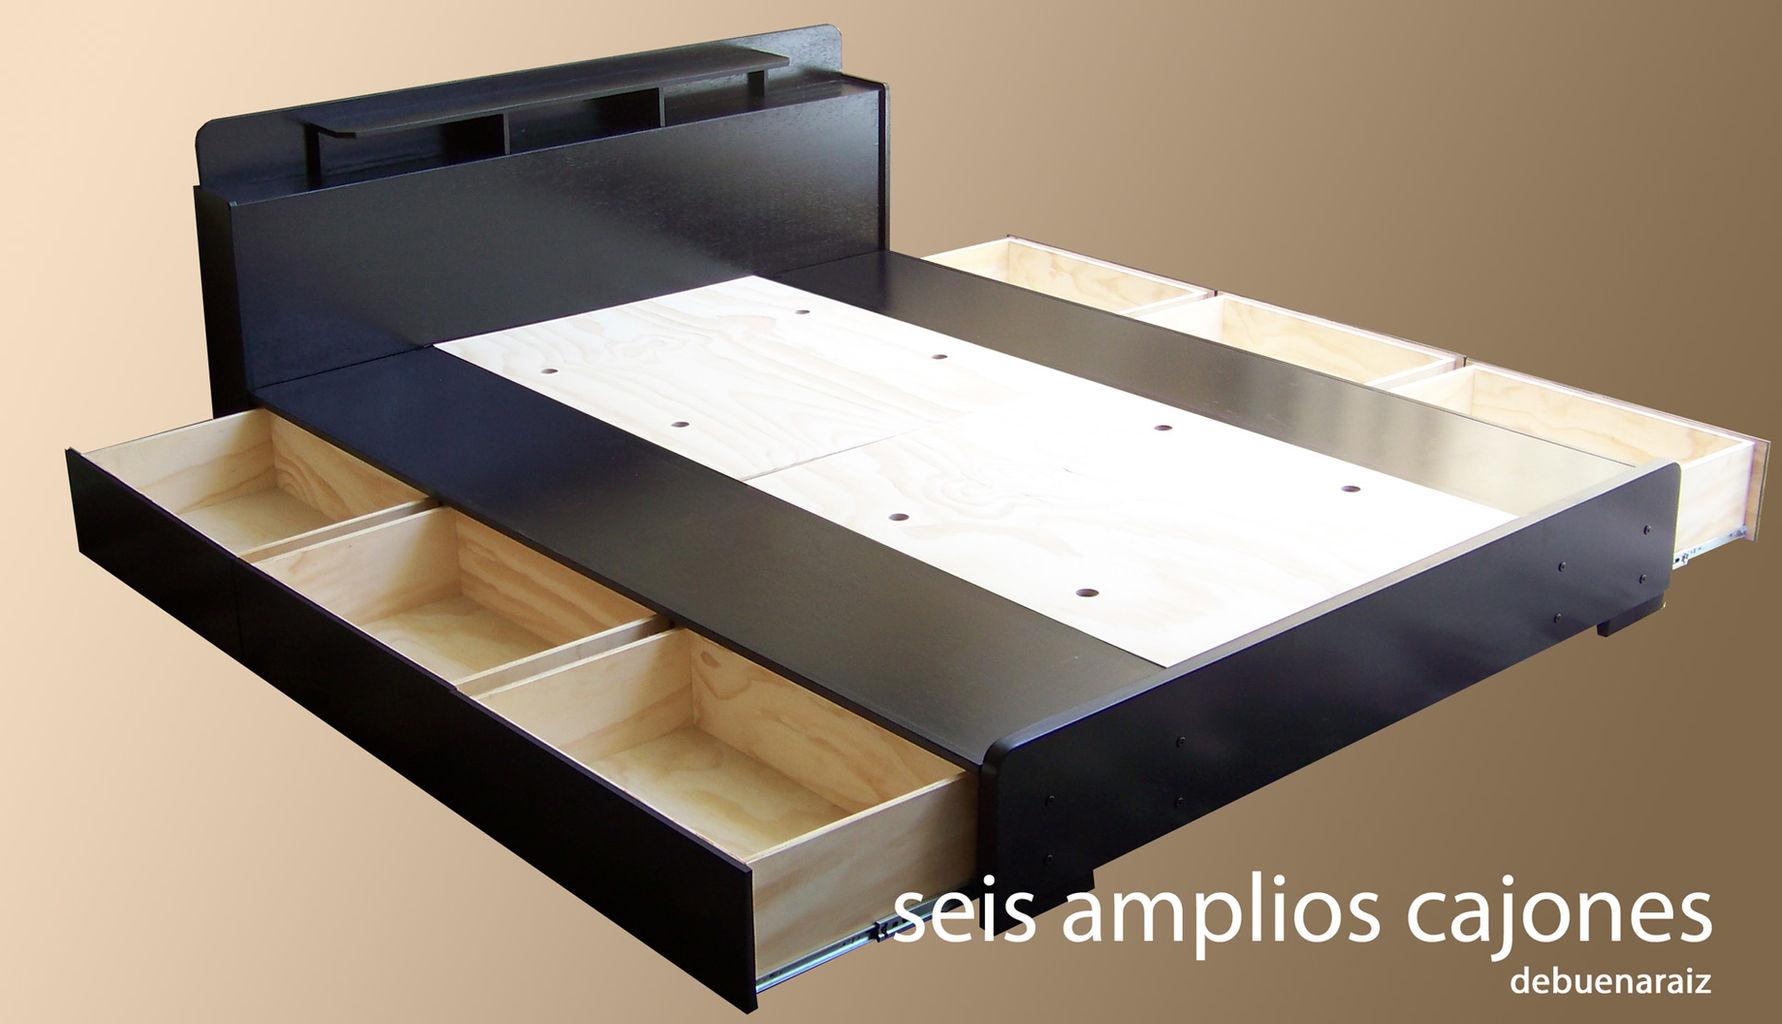 Bases de cama imagen with bases de cama gallery of te - Bases para cama ...